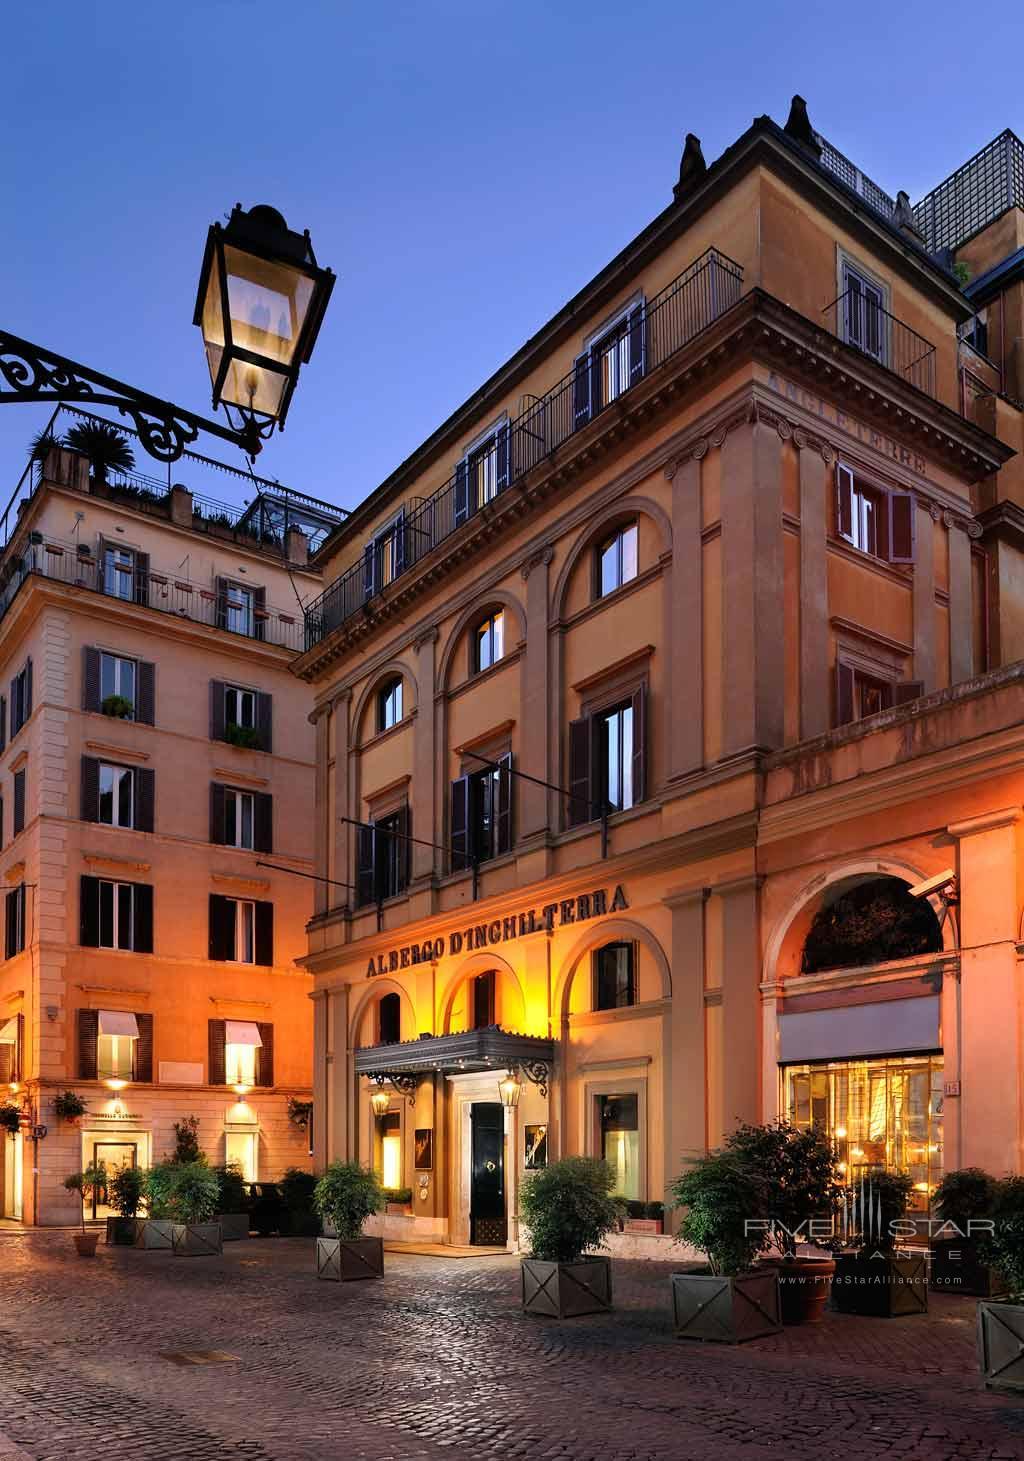 Hotel d'Inghilterra Rome